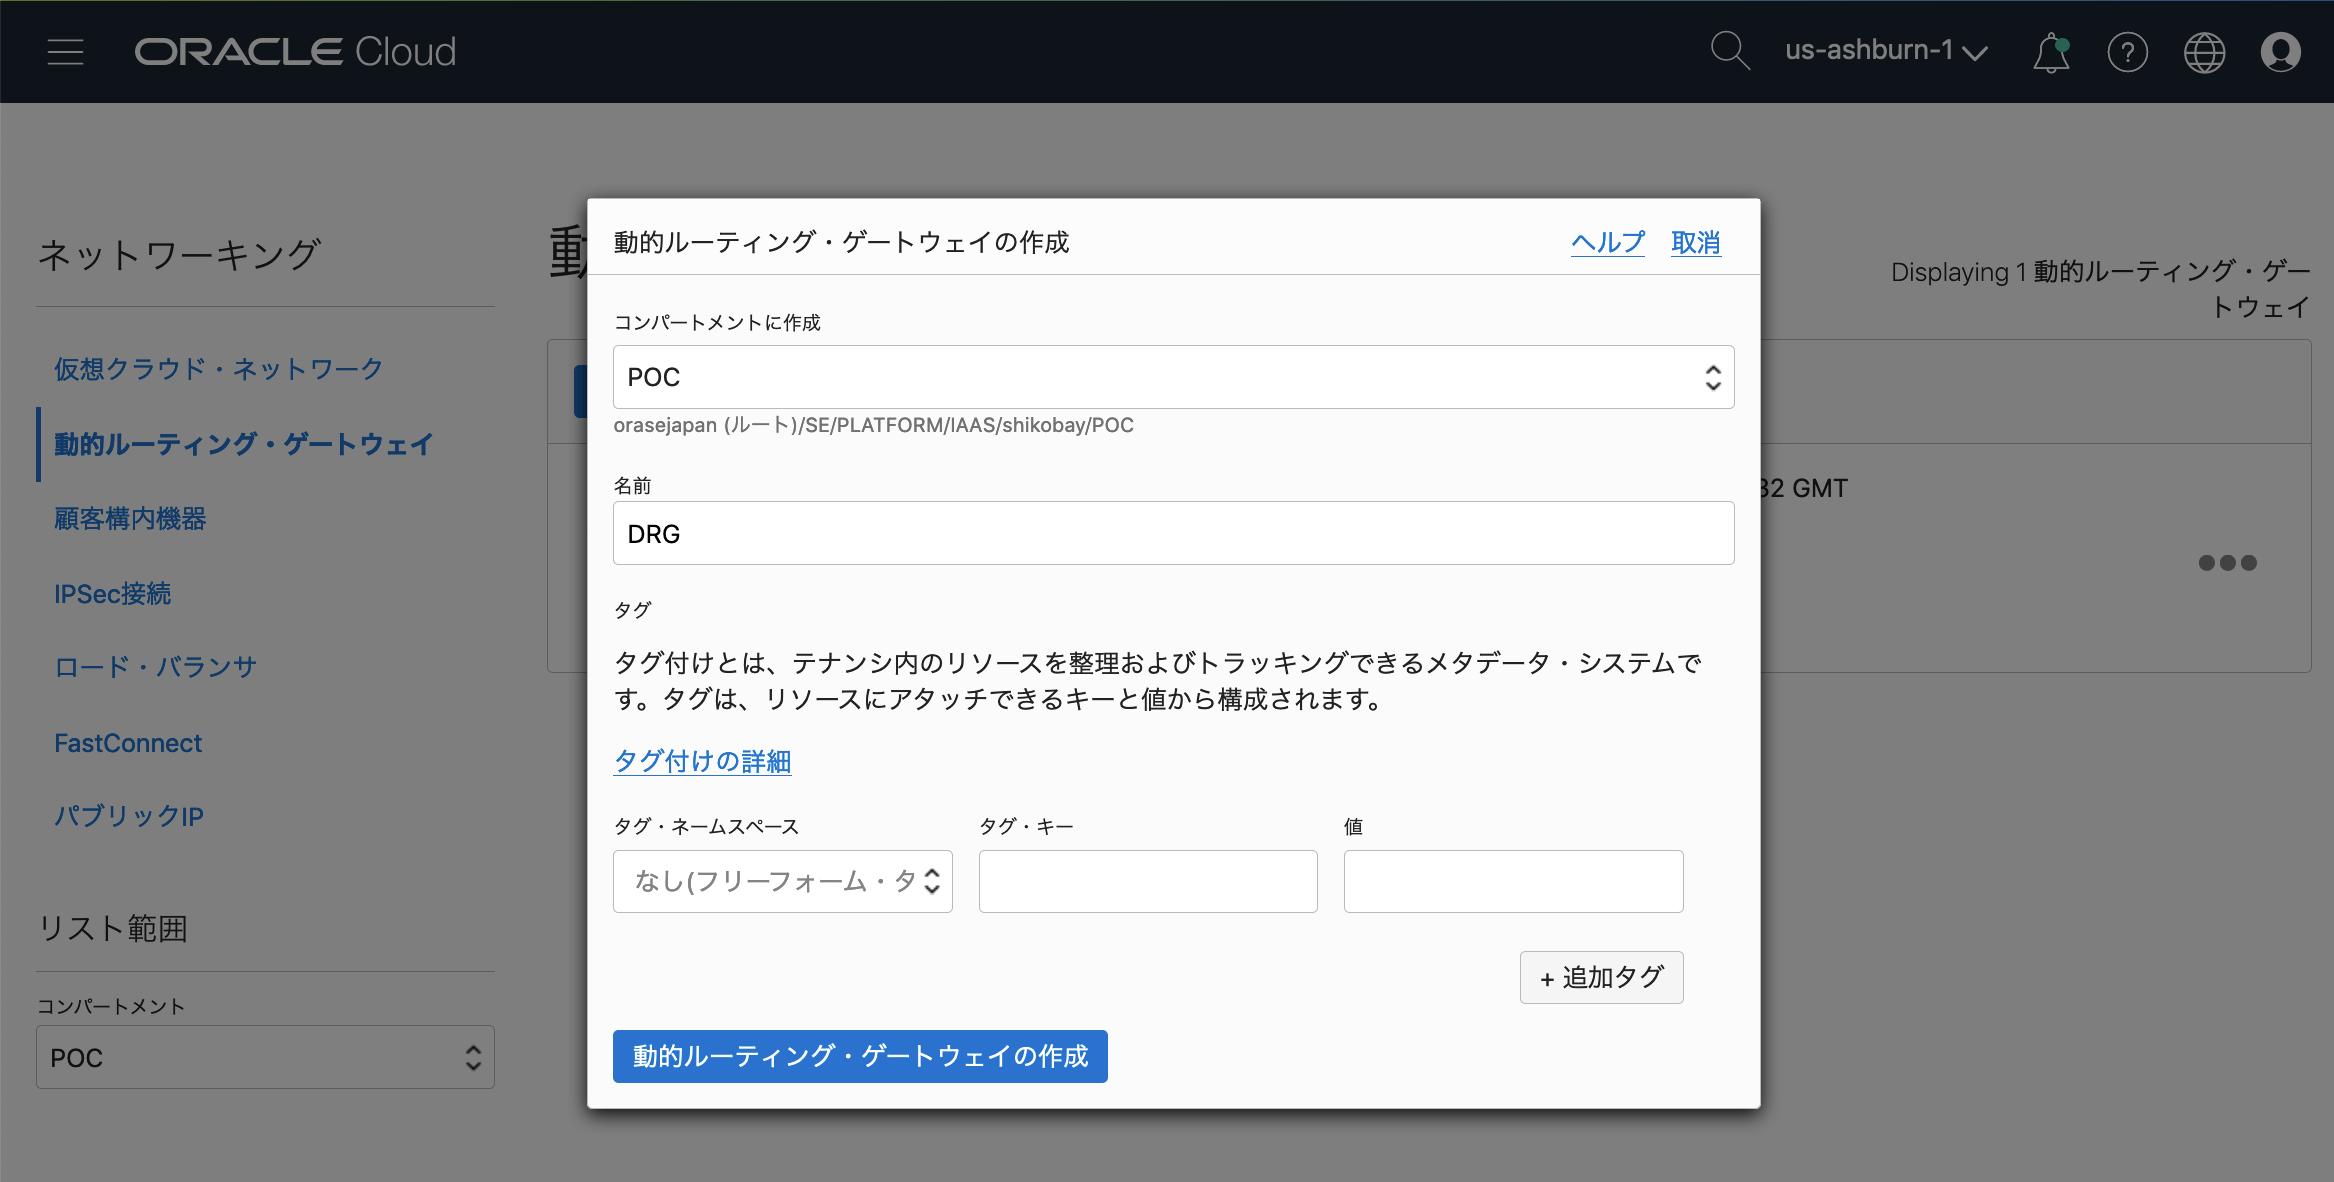 7_DRG01.png